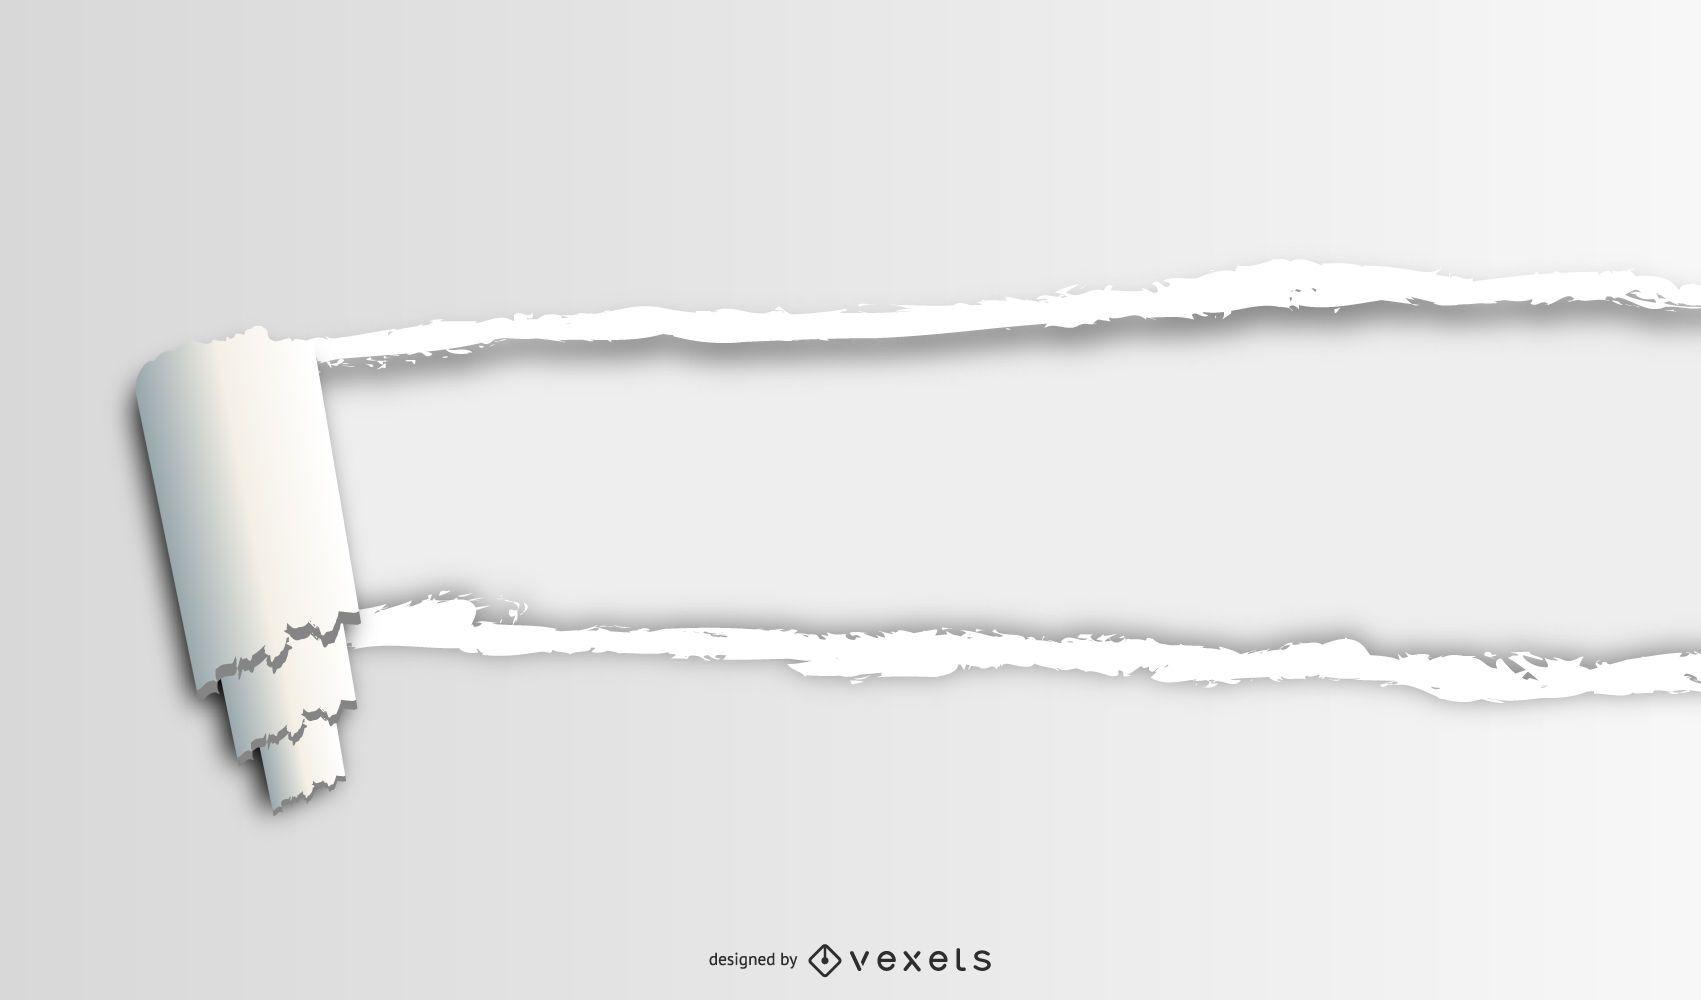 Diseño simple de lágrima de papel